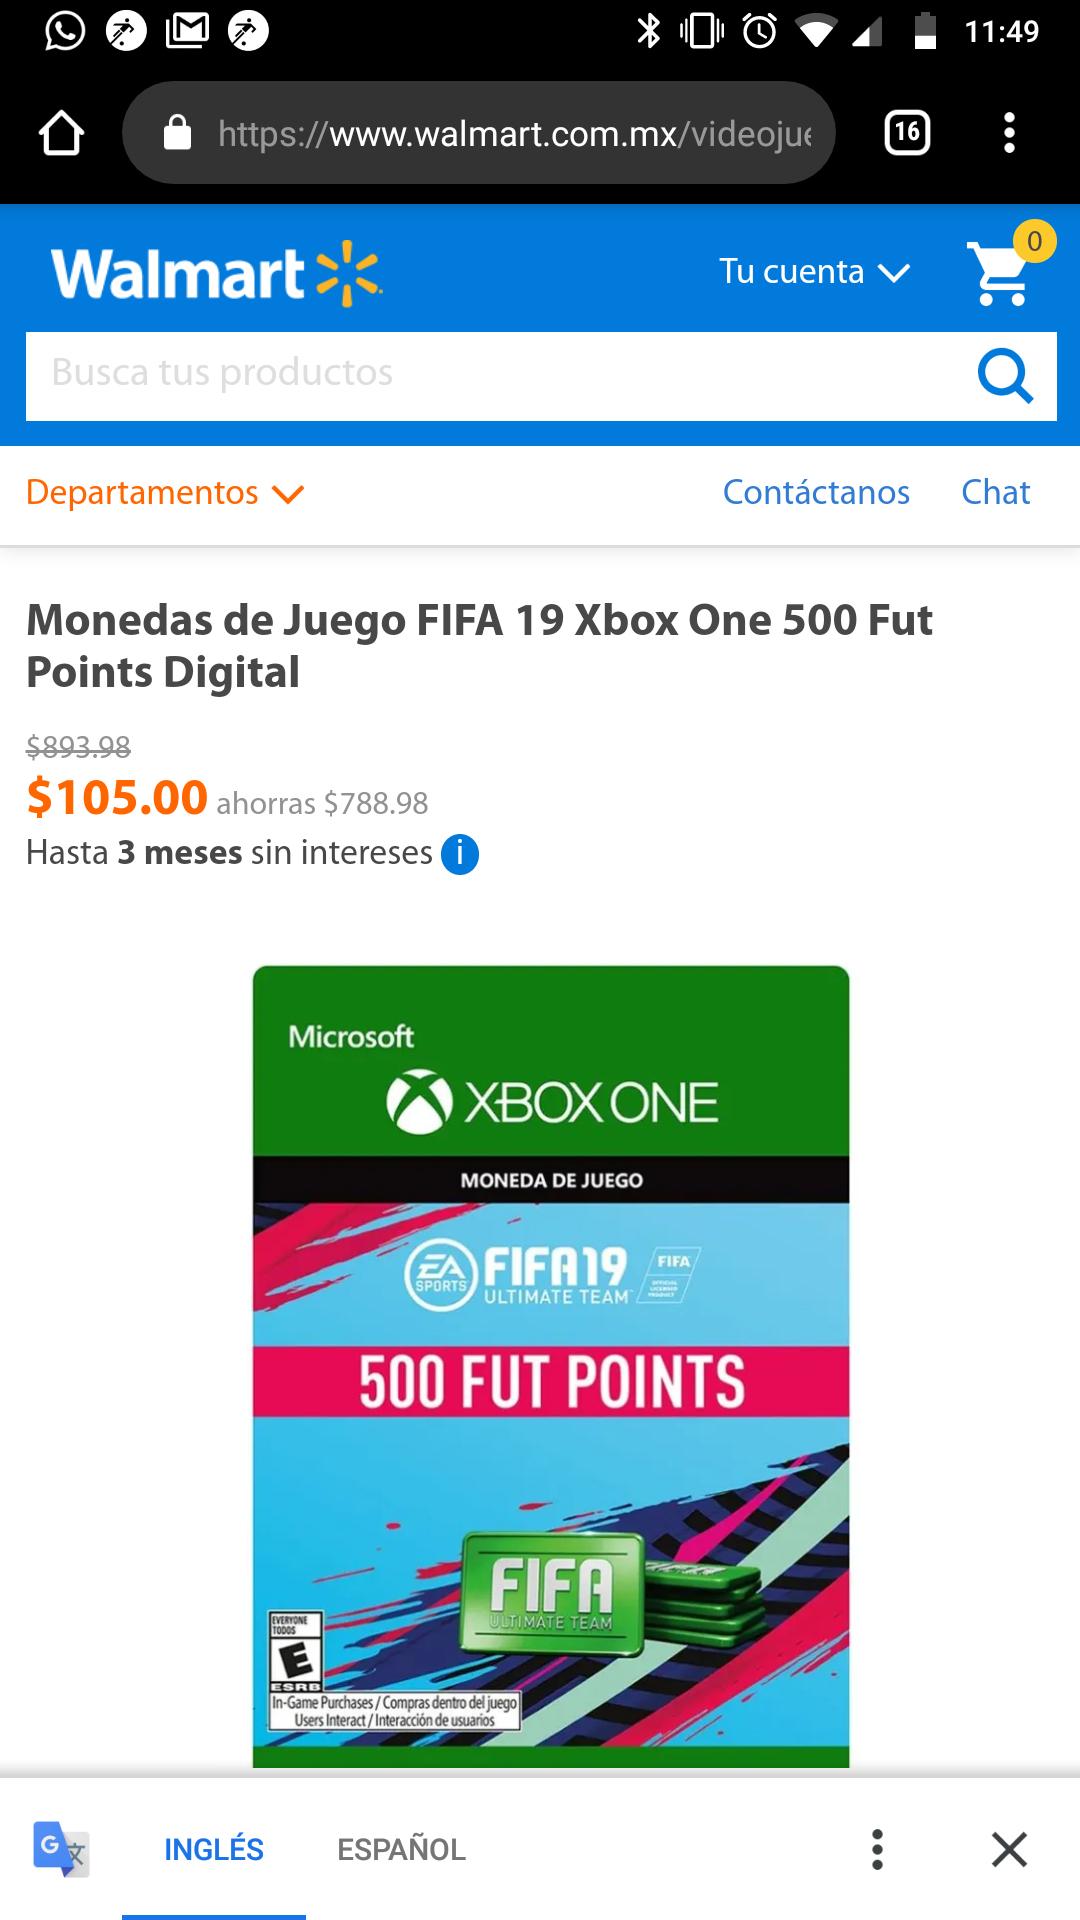 Walmart: 500 FIFA POINTS